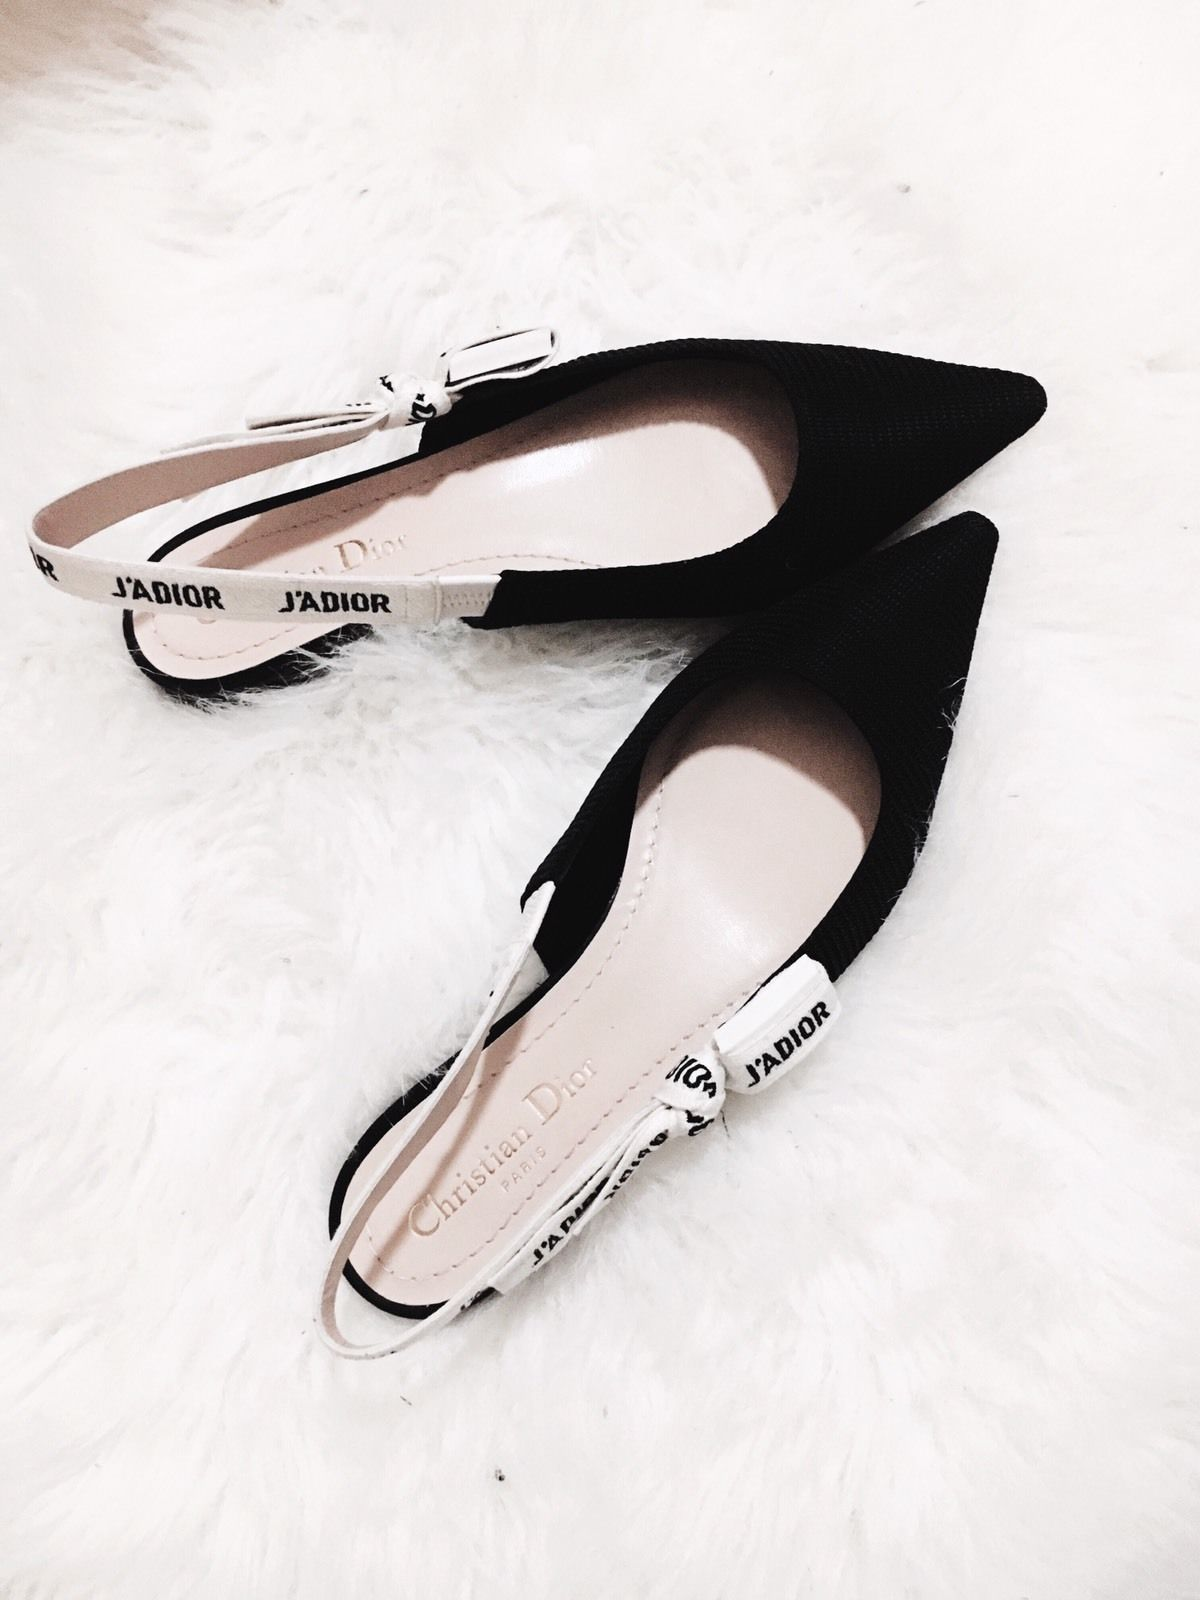 0e77210352a Brand New Christian Dior J adior Jadior Black Flat Slingback Shoes - Size 35